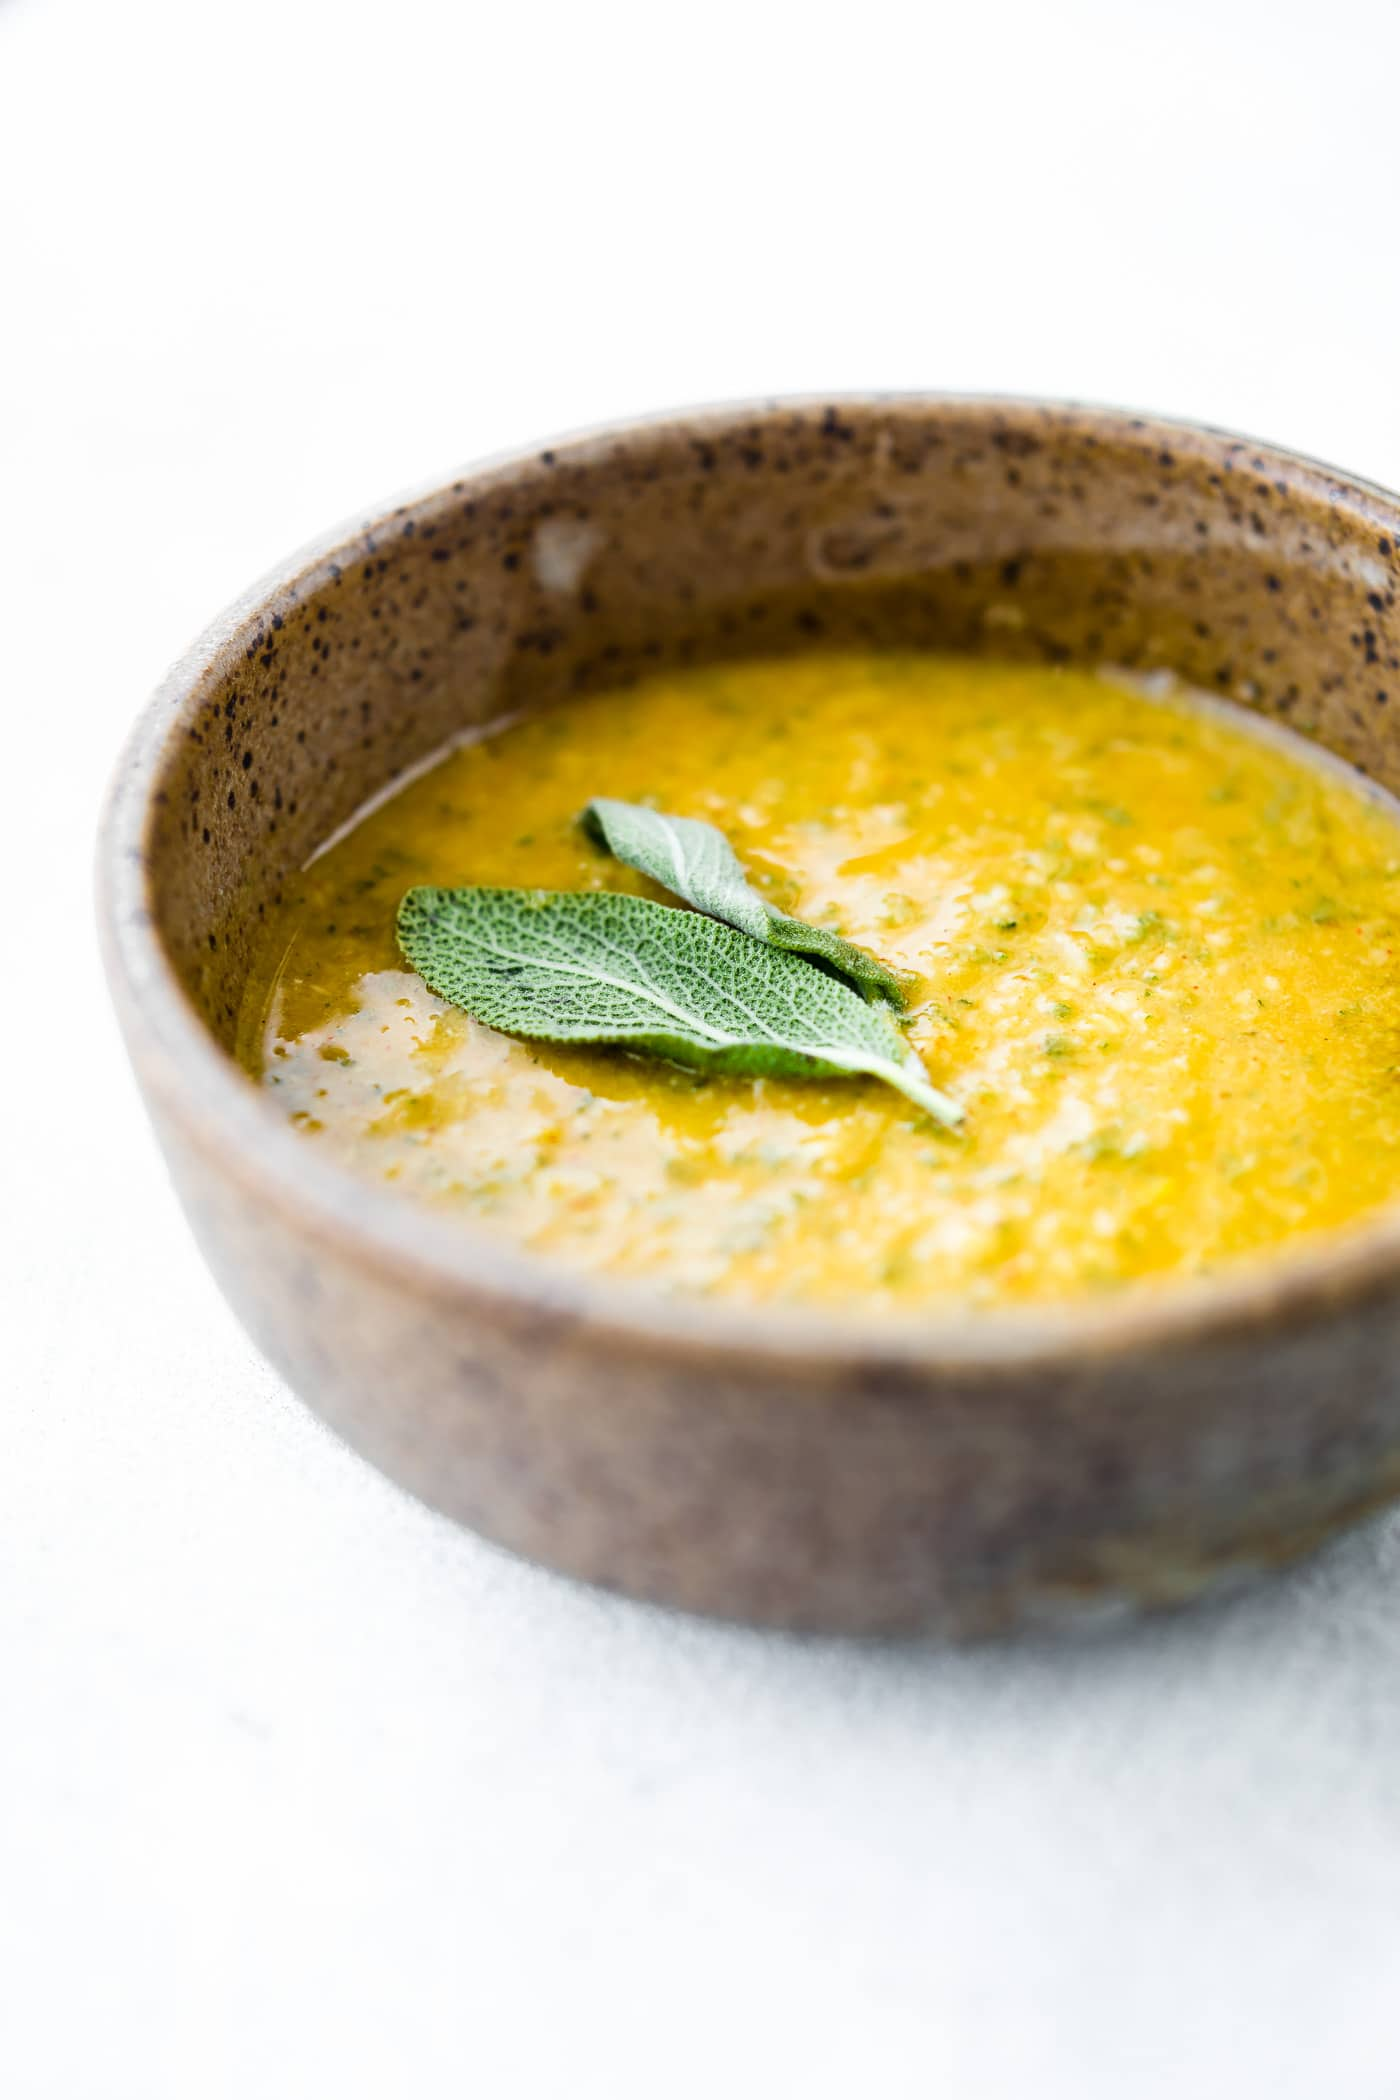 Lemon Sage marinade Baked Chicken and Olives in